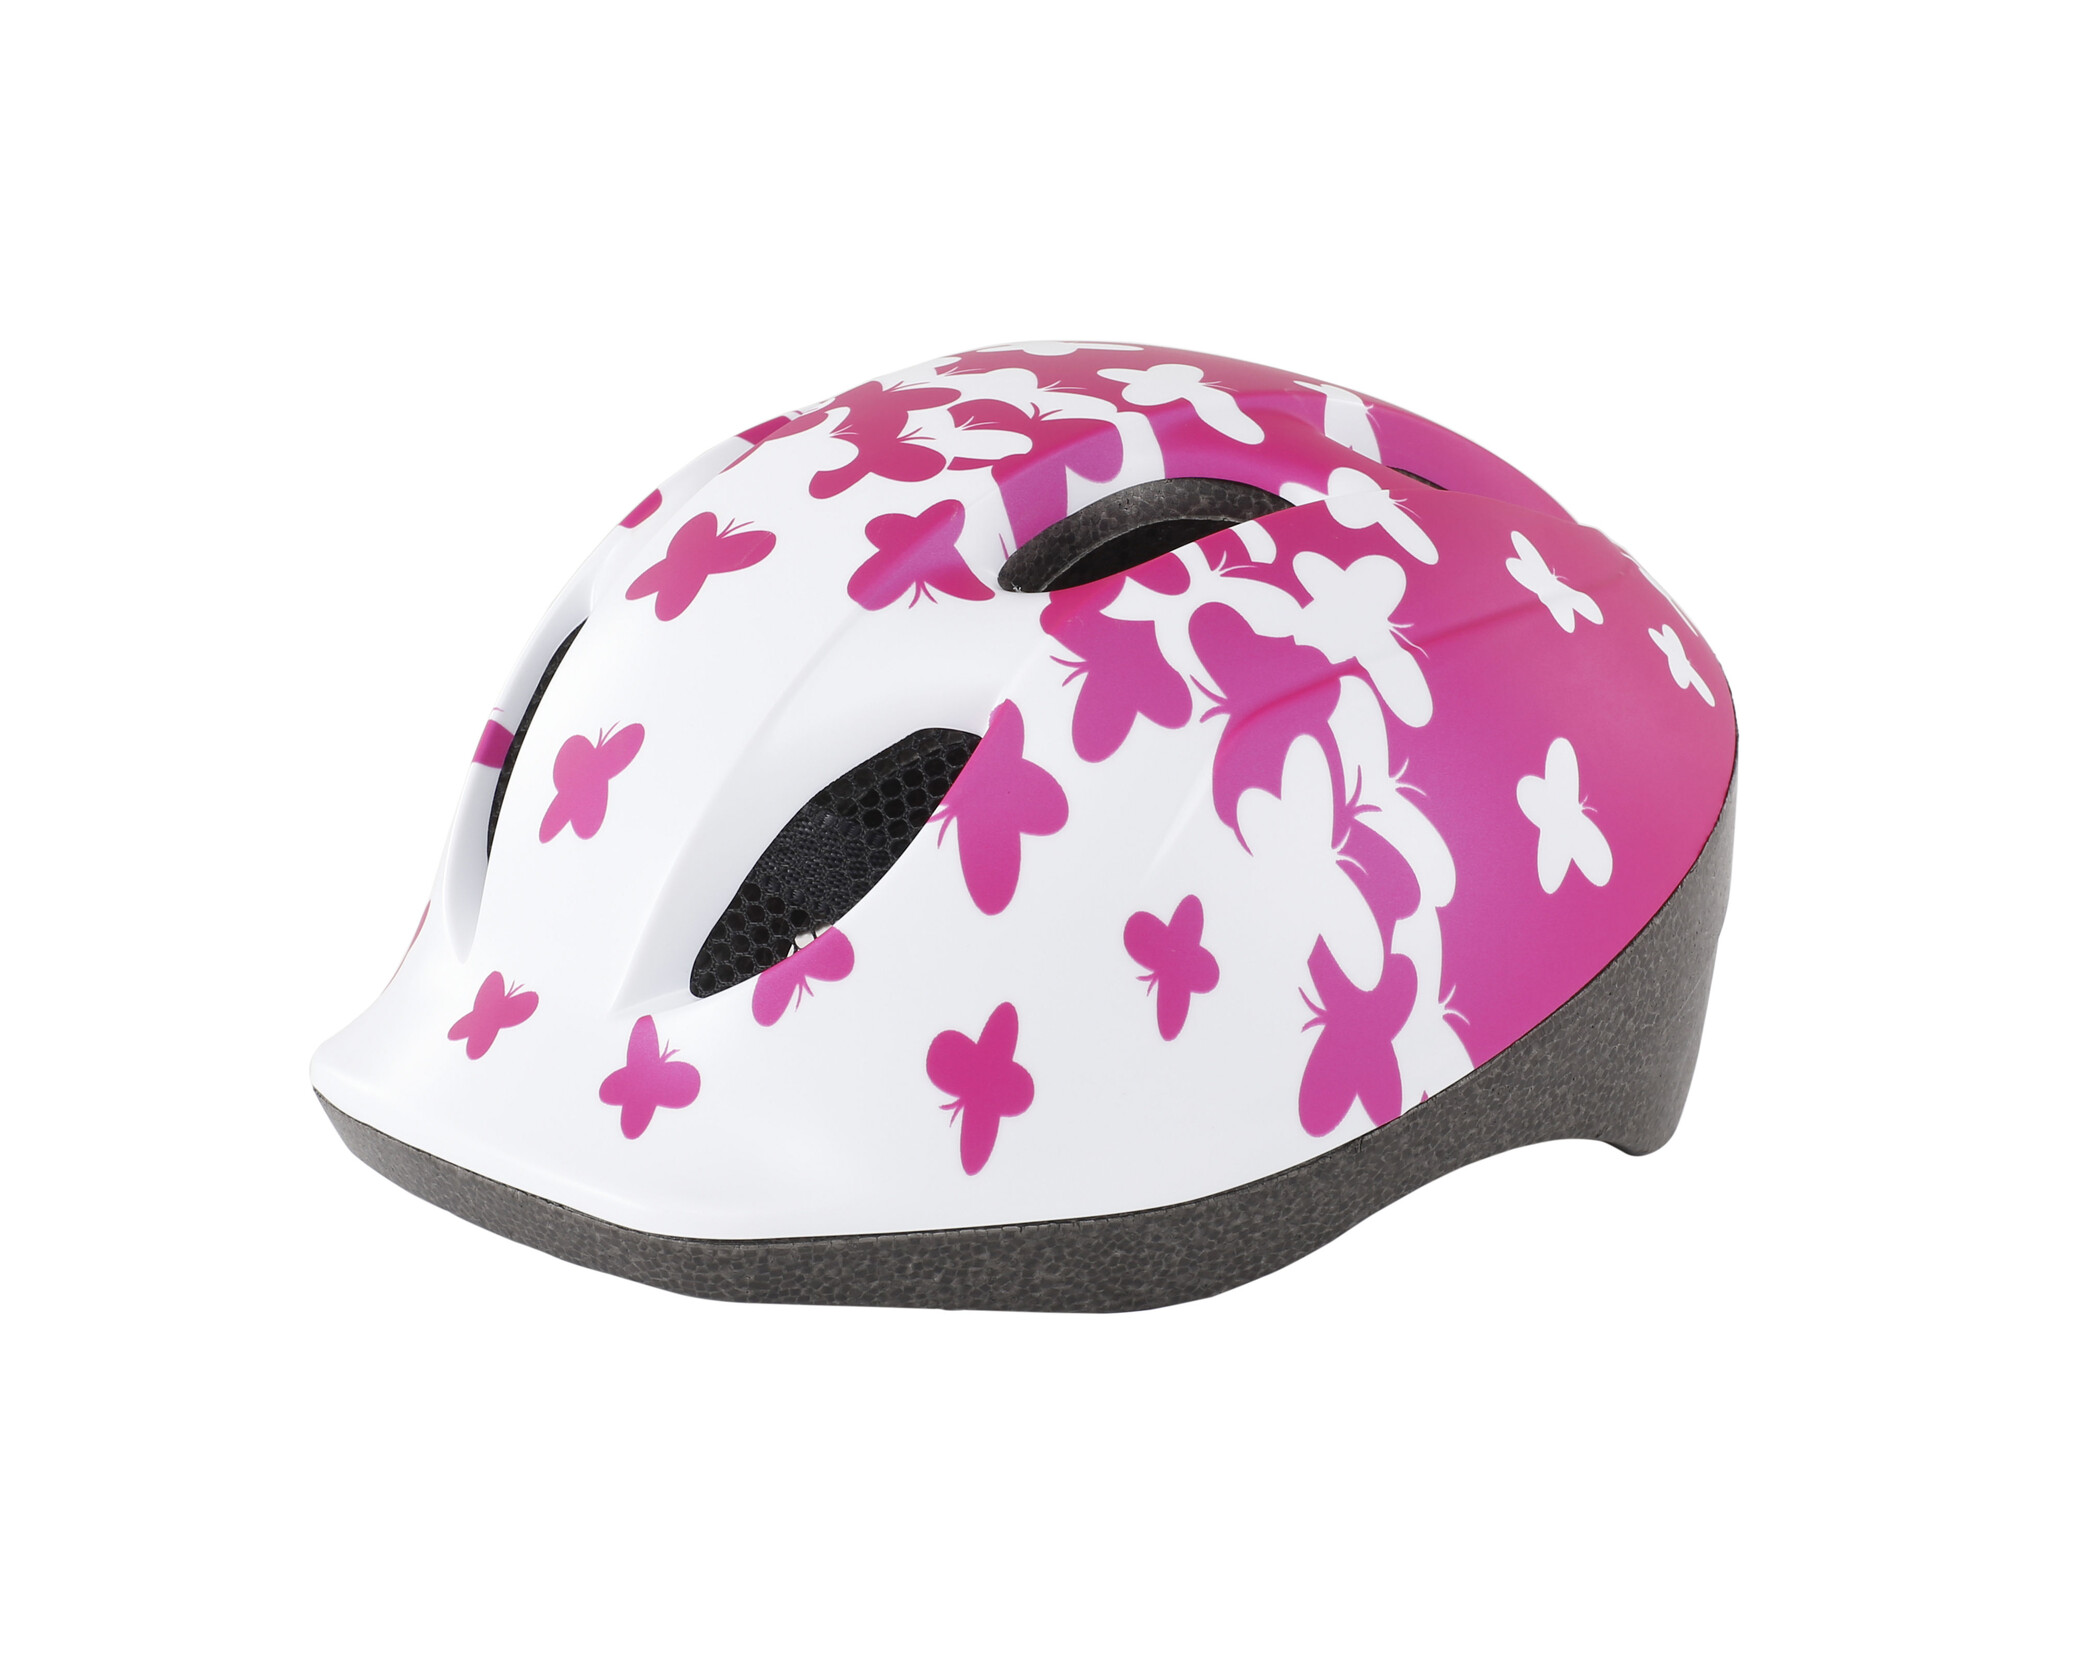 MET Buddy Cykelhjelm Børn, pink butterflies (2019) | Helmets